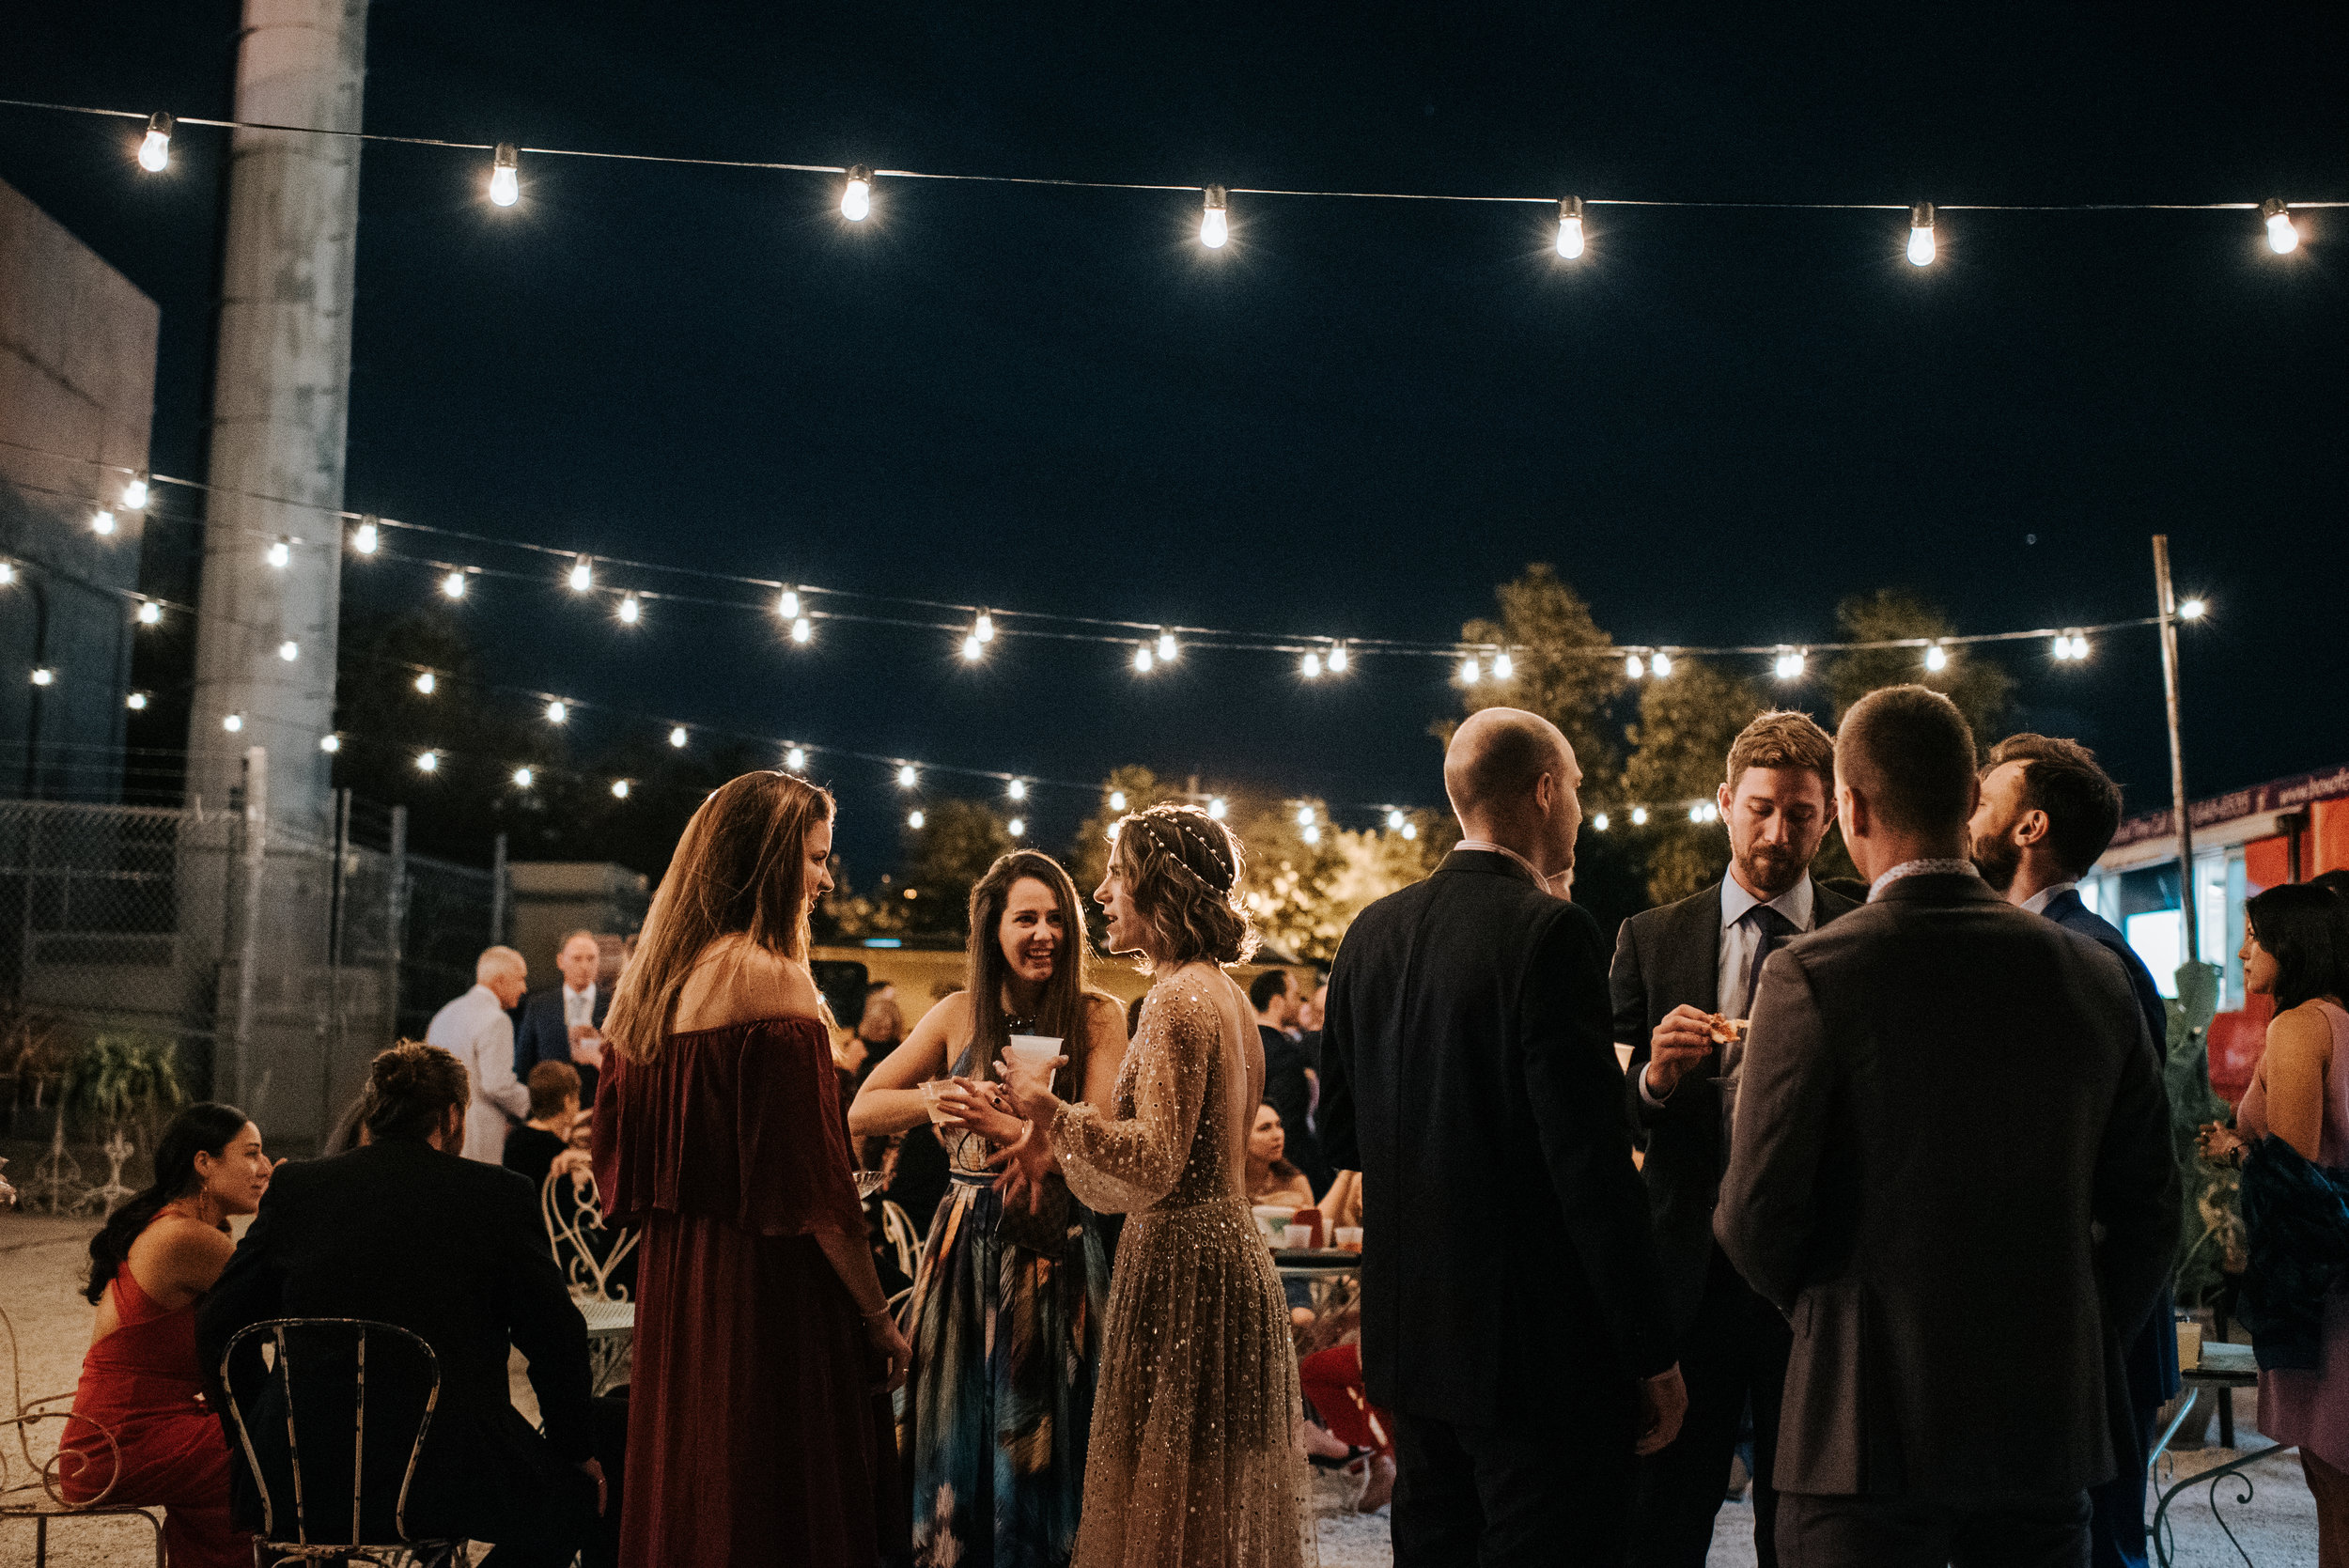 stephanie-bobby-ace-prop-house-miami-florida-wedding-1164.jpg